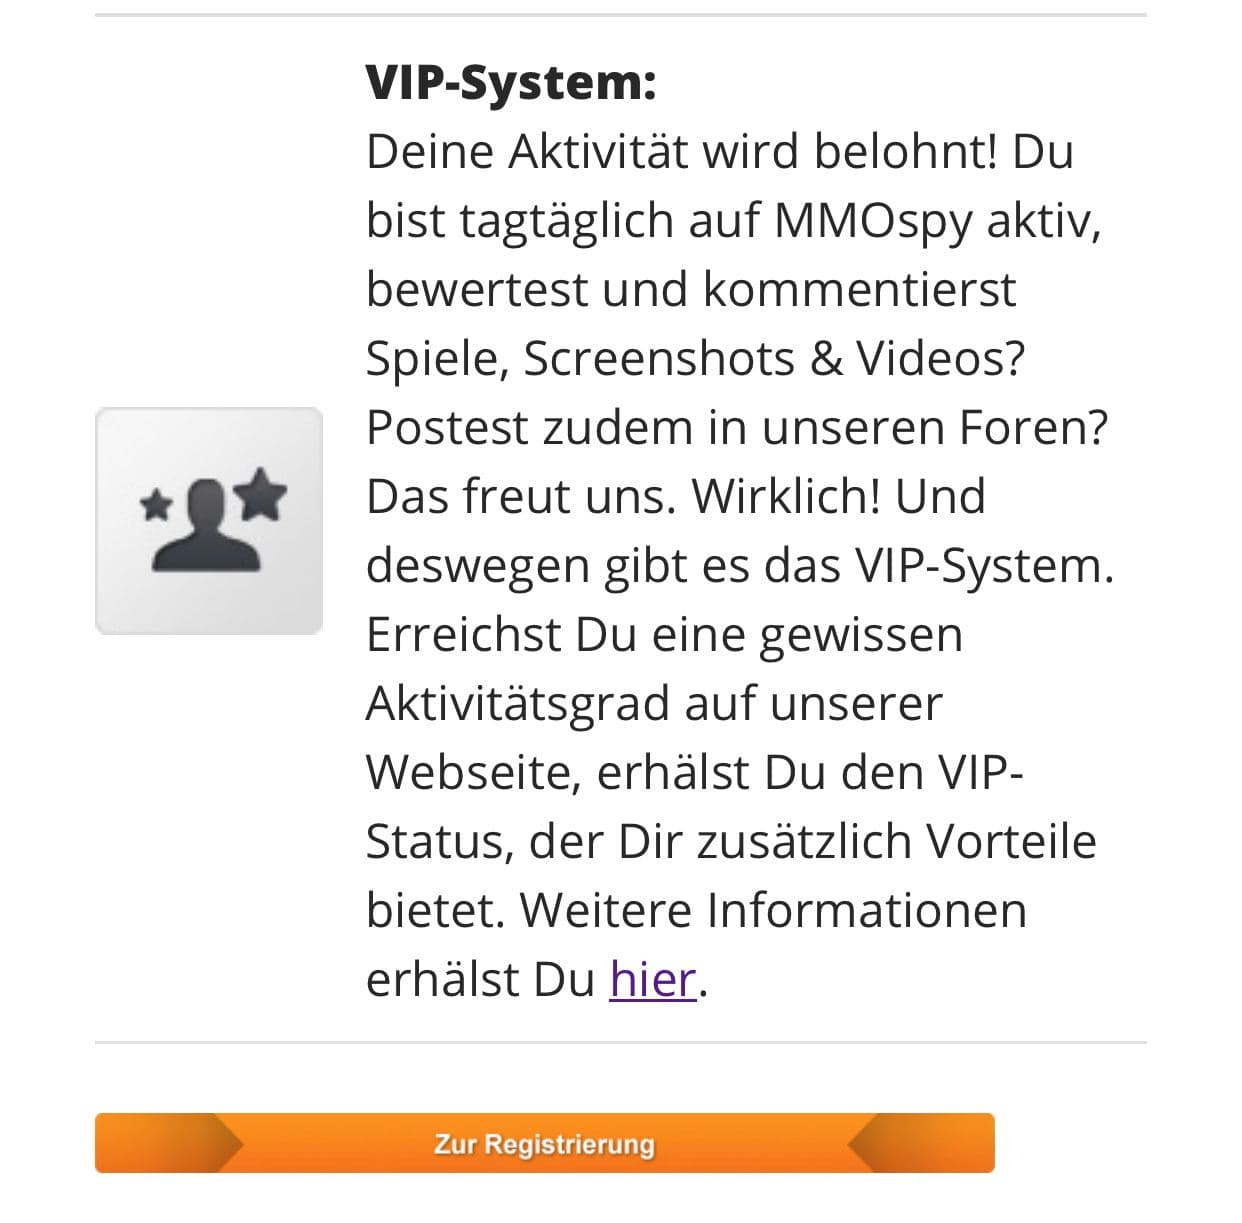 https://www.mmo-spy.de/uploads/vip4.jpg